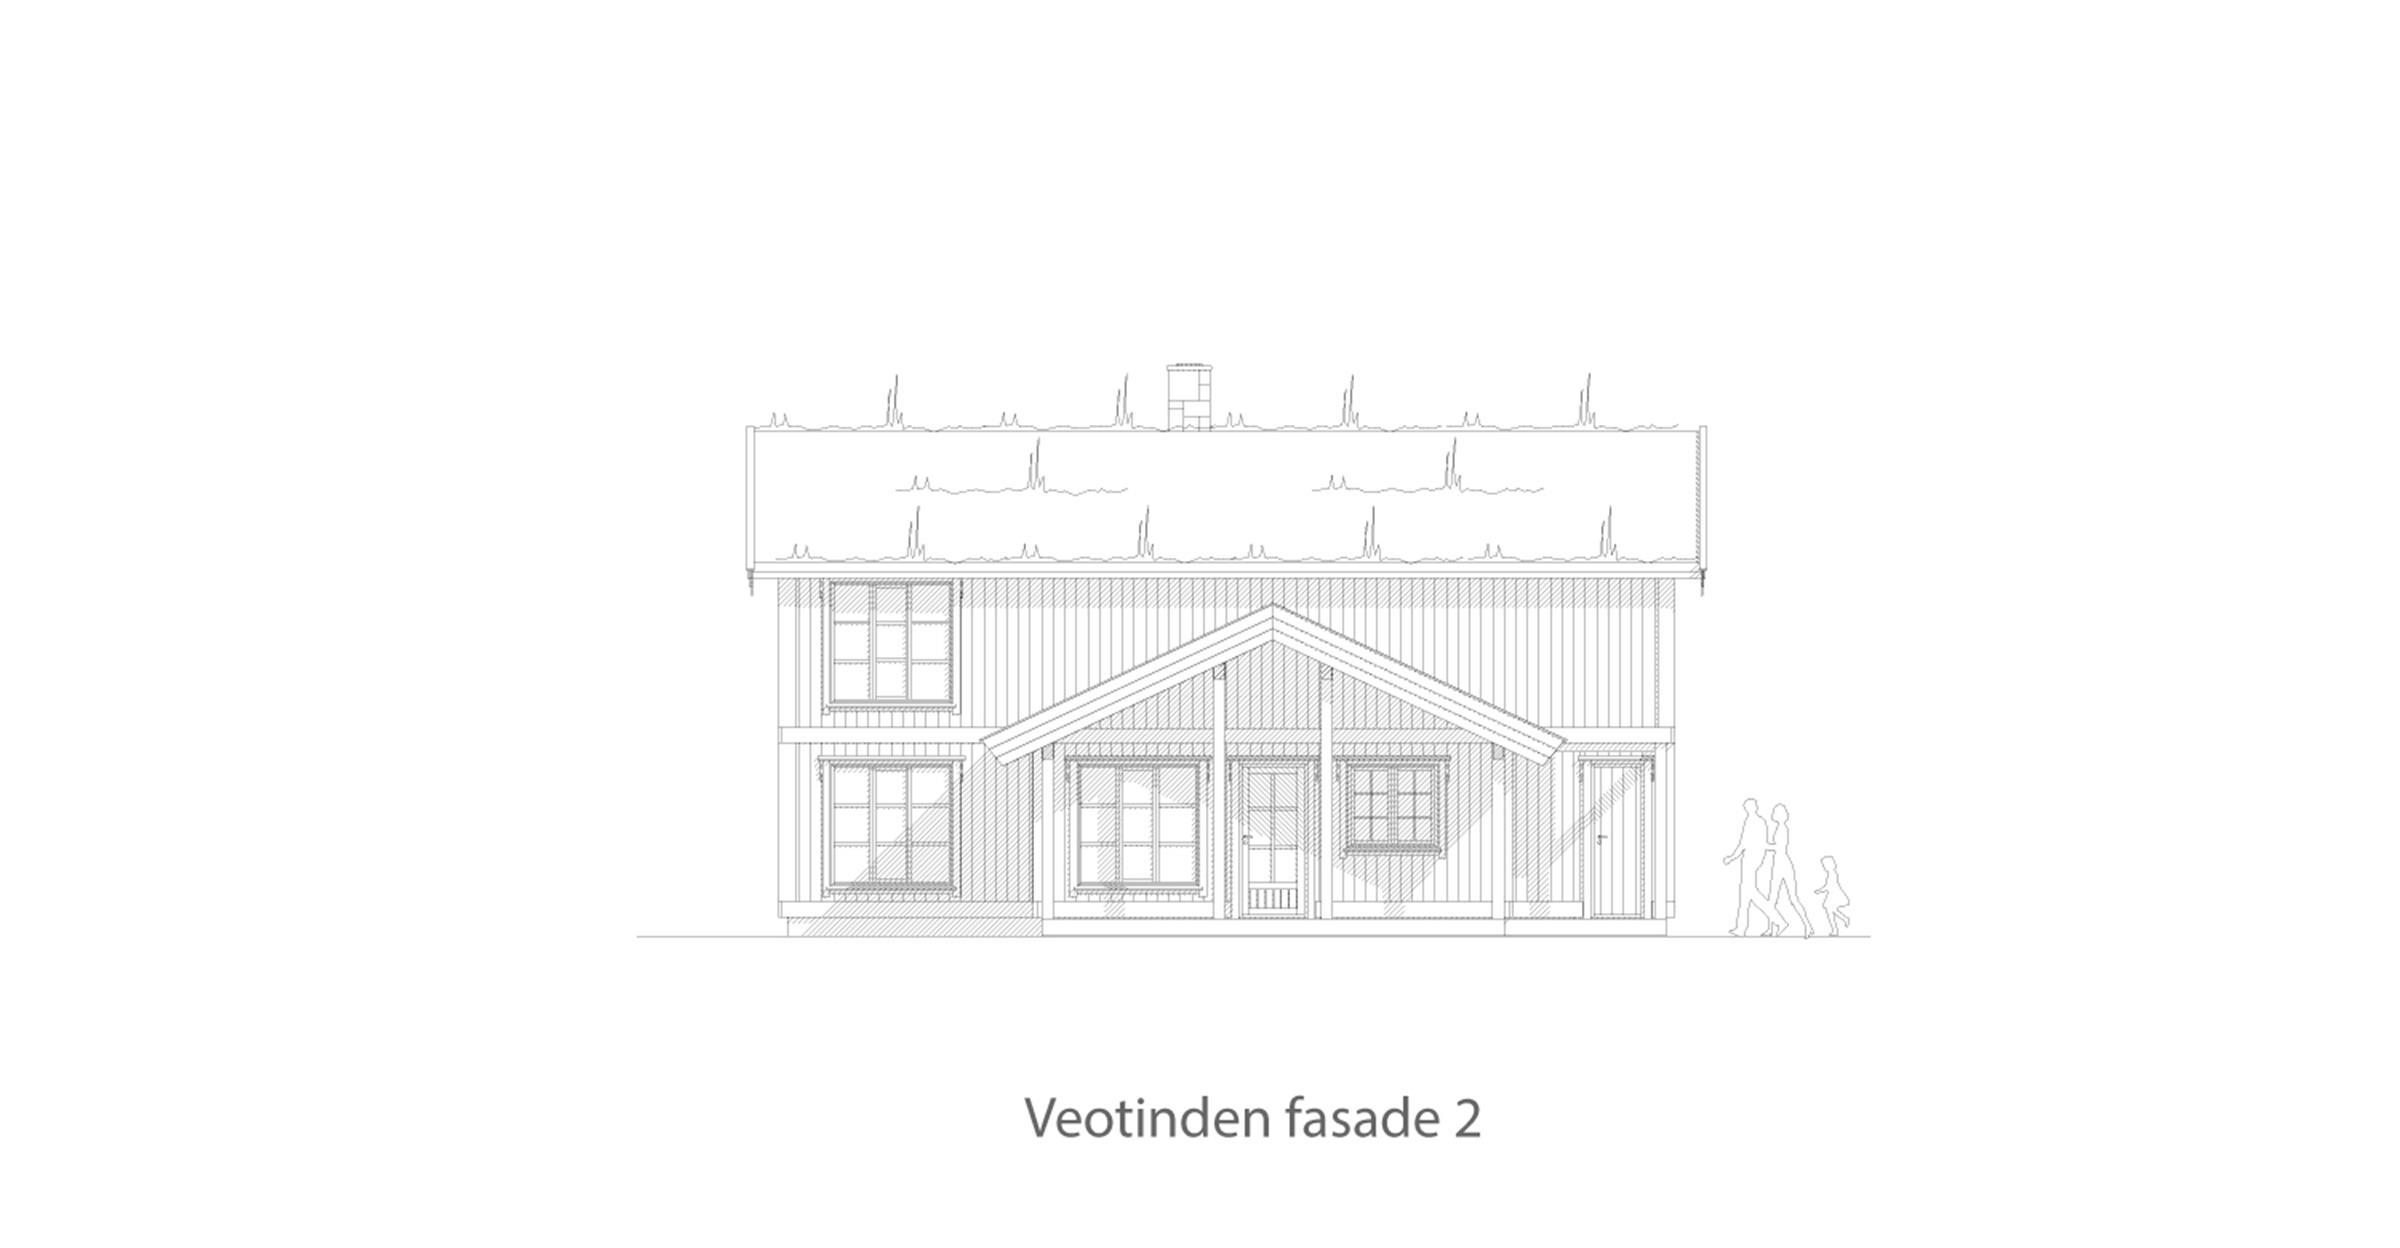 Veotinden fasade 2